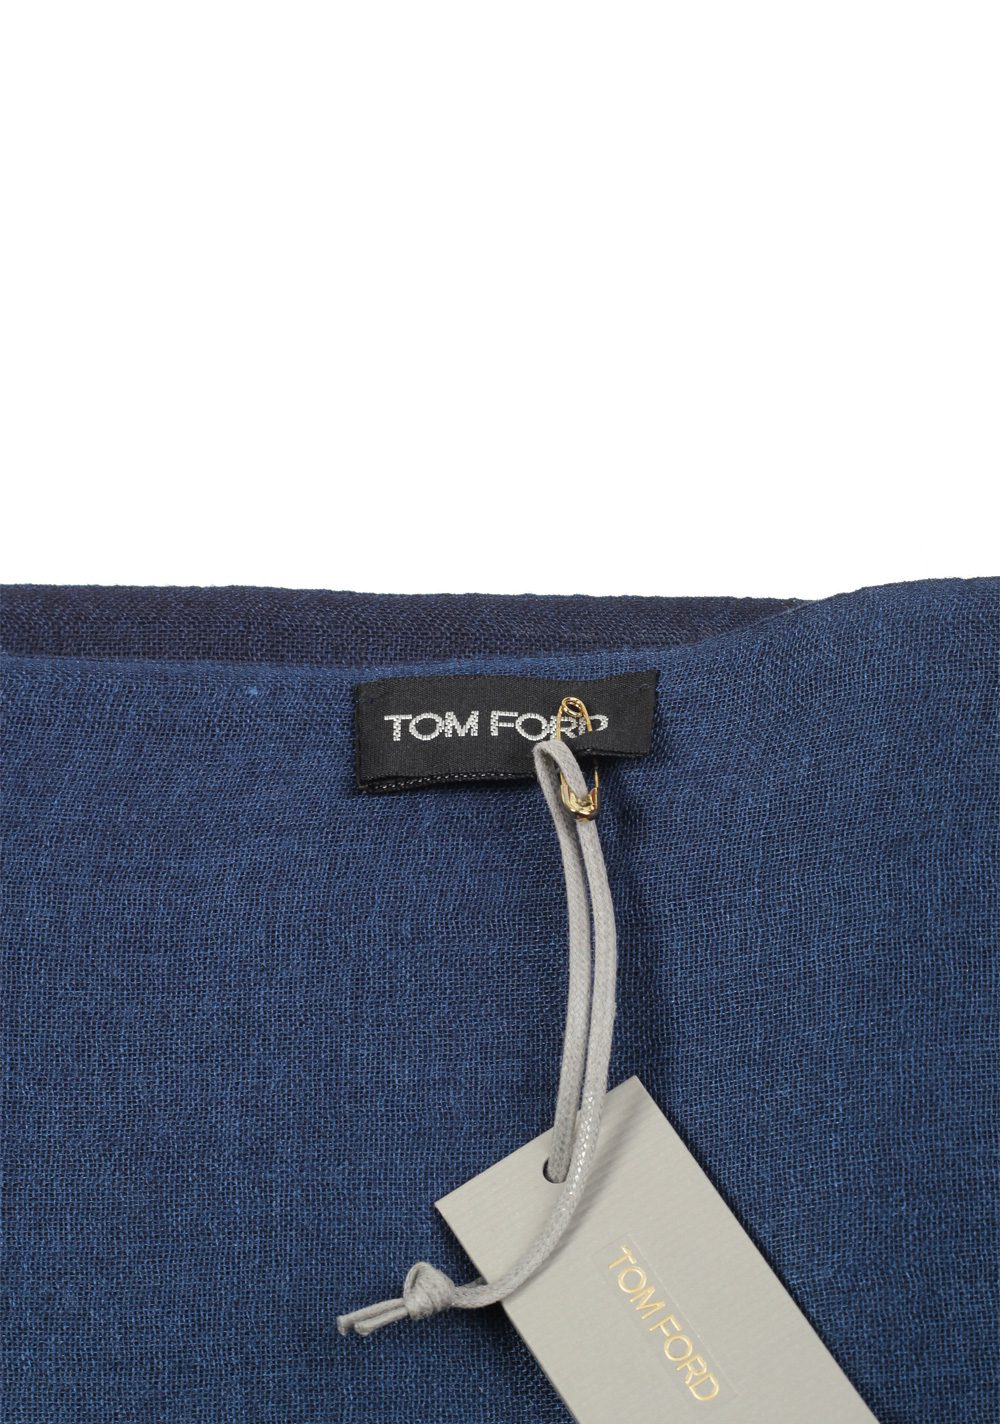 Tom Ford Blue Cashmere Silk Signature Scarf 75″ / 30″   Costume Limité